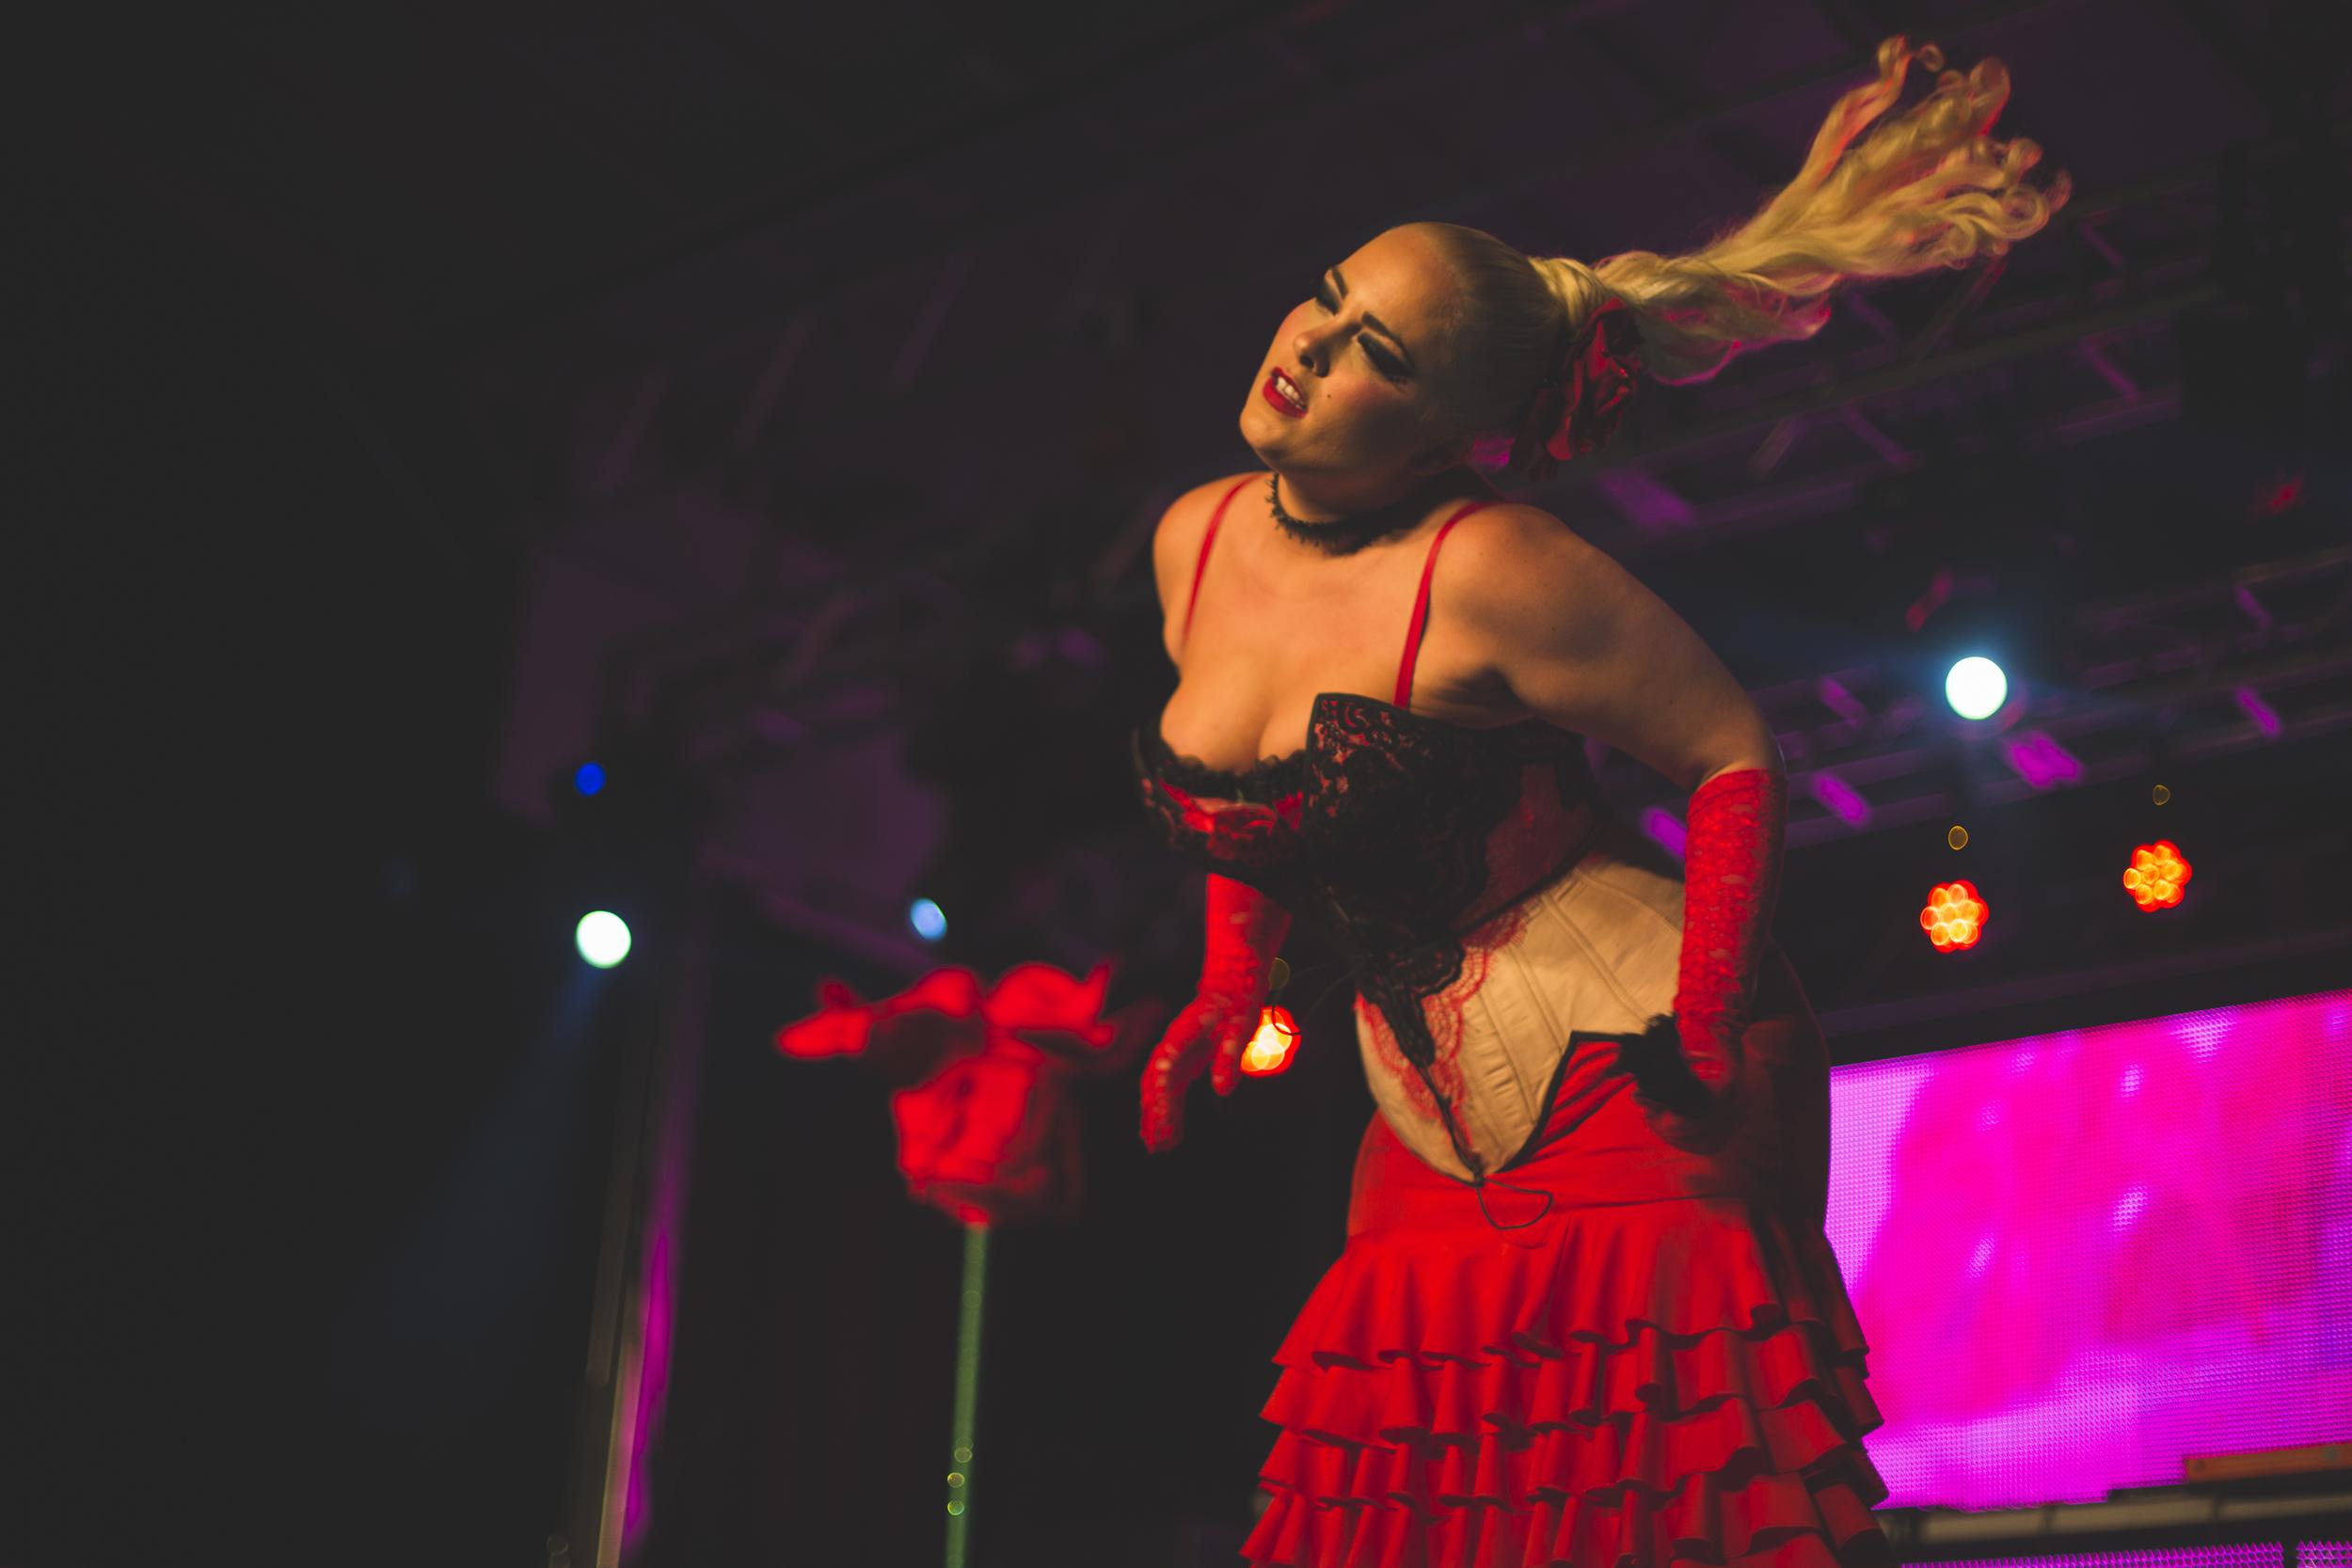 Pride_Toronto_2015_Burlesque_A_Go_Go_by_Indeana_Underhill-108.jpg